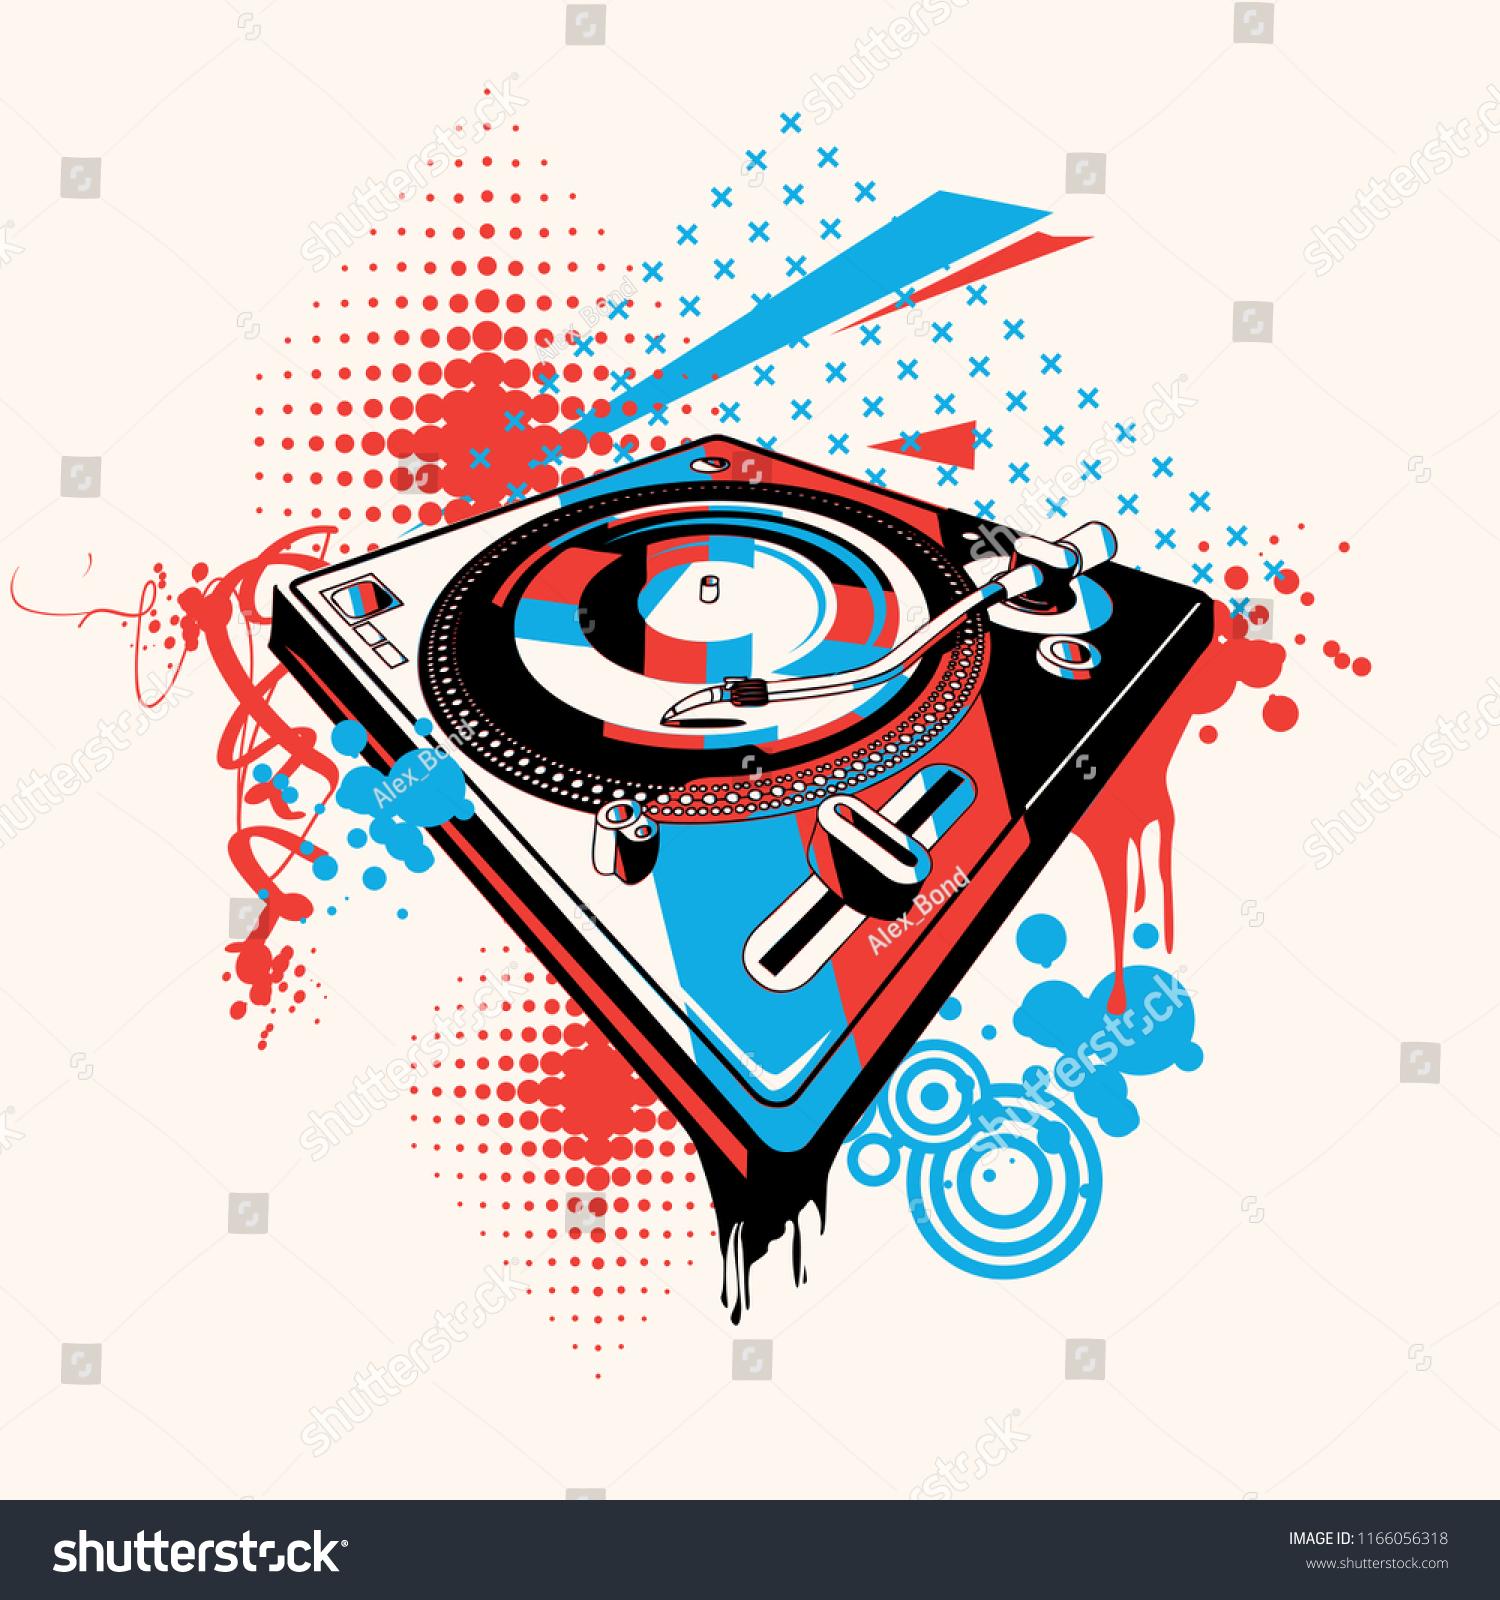 Funky turntable music graffiti